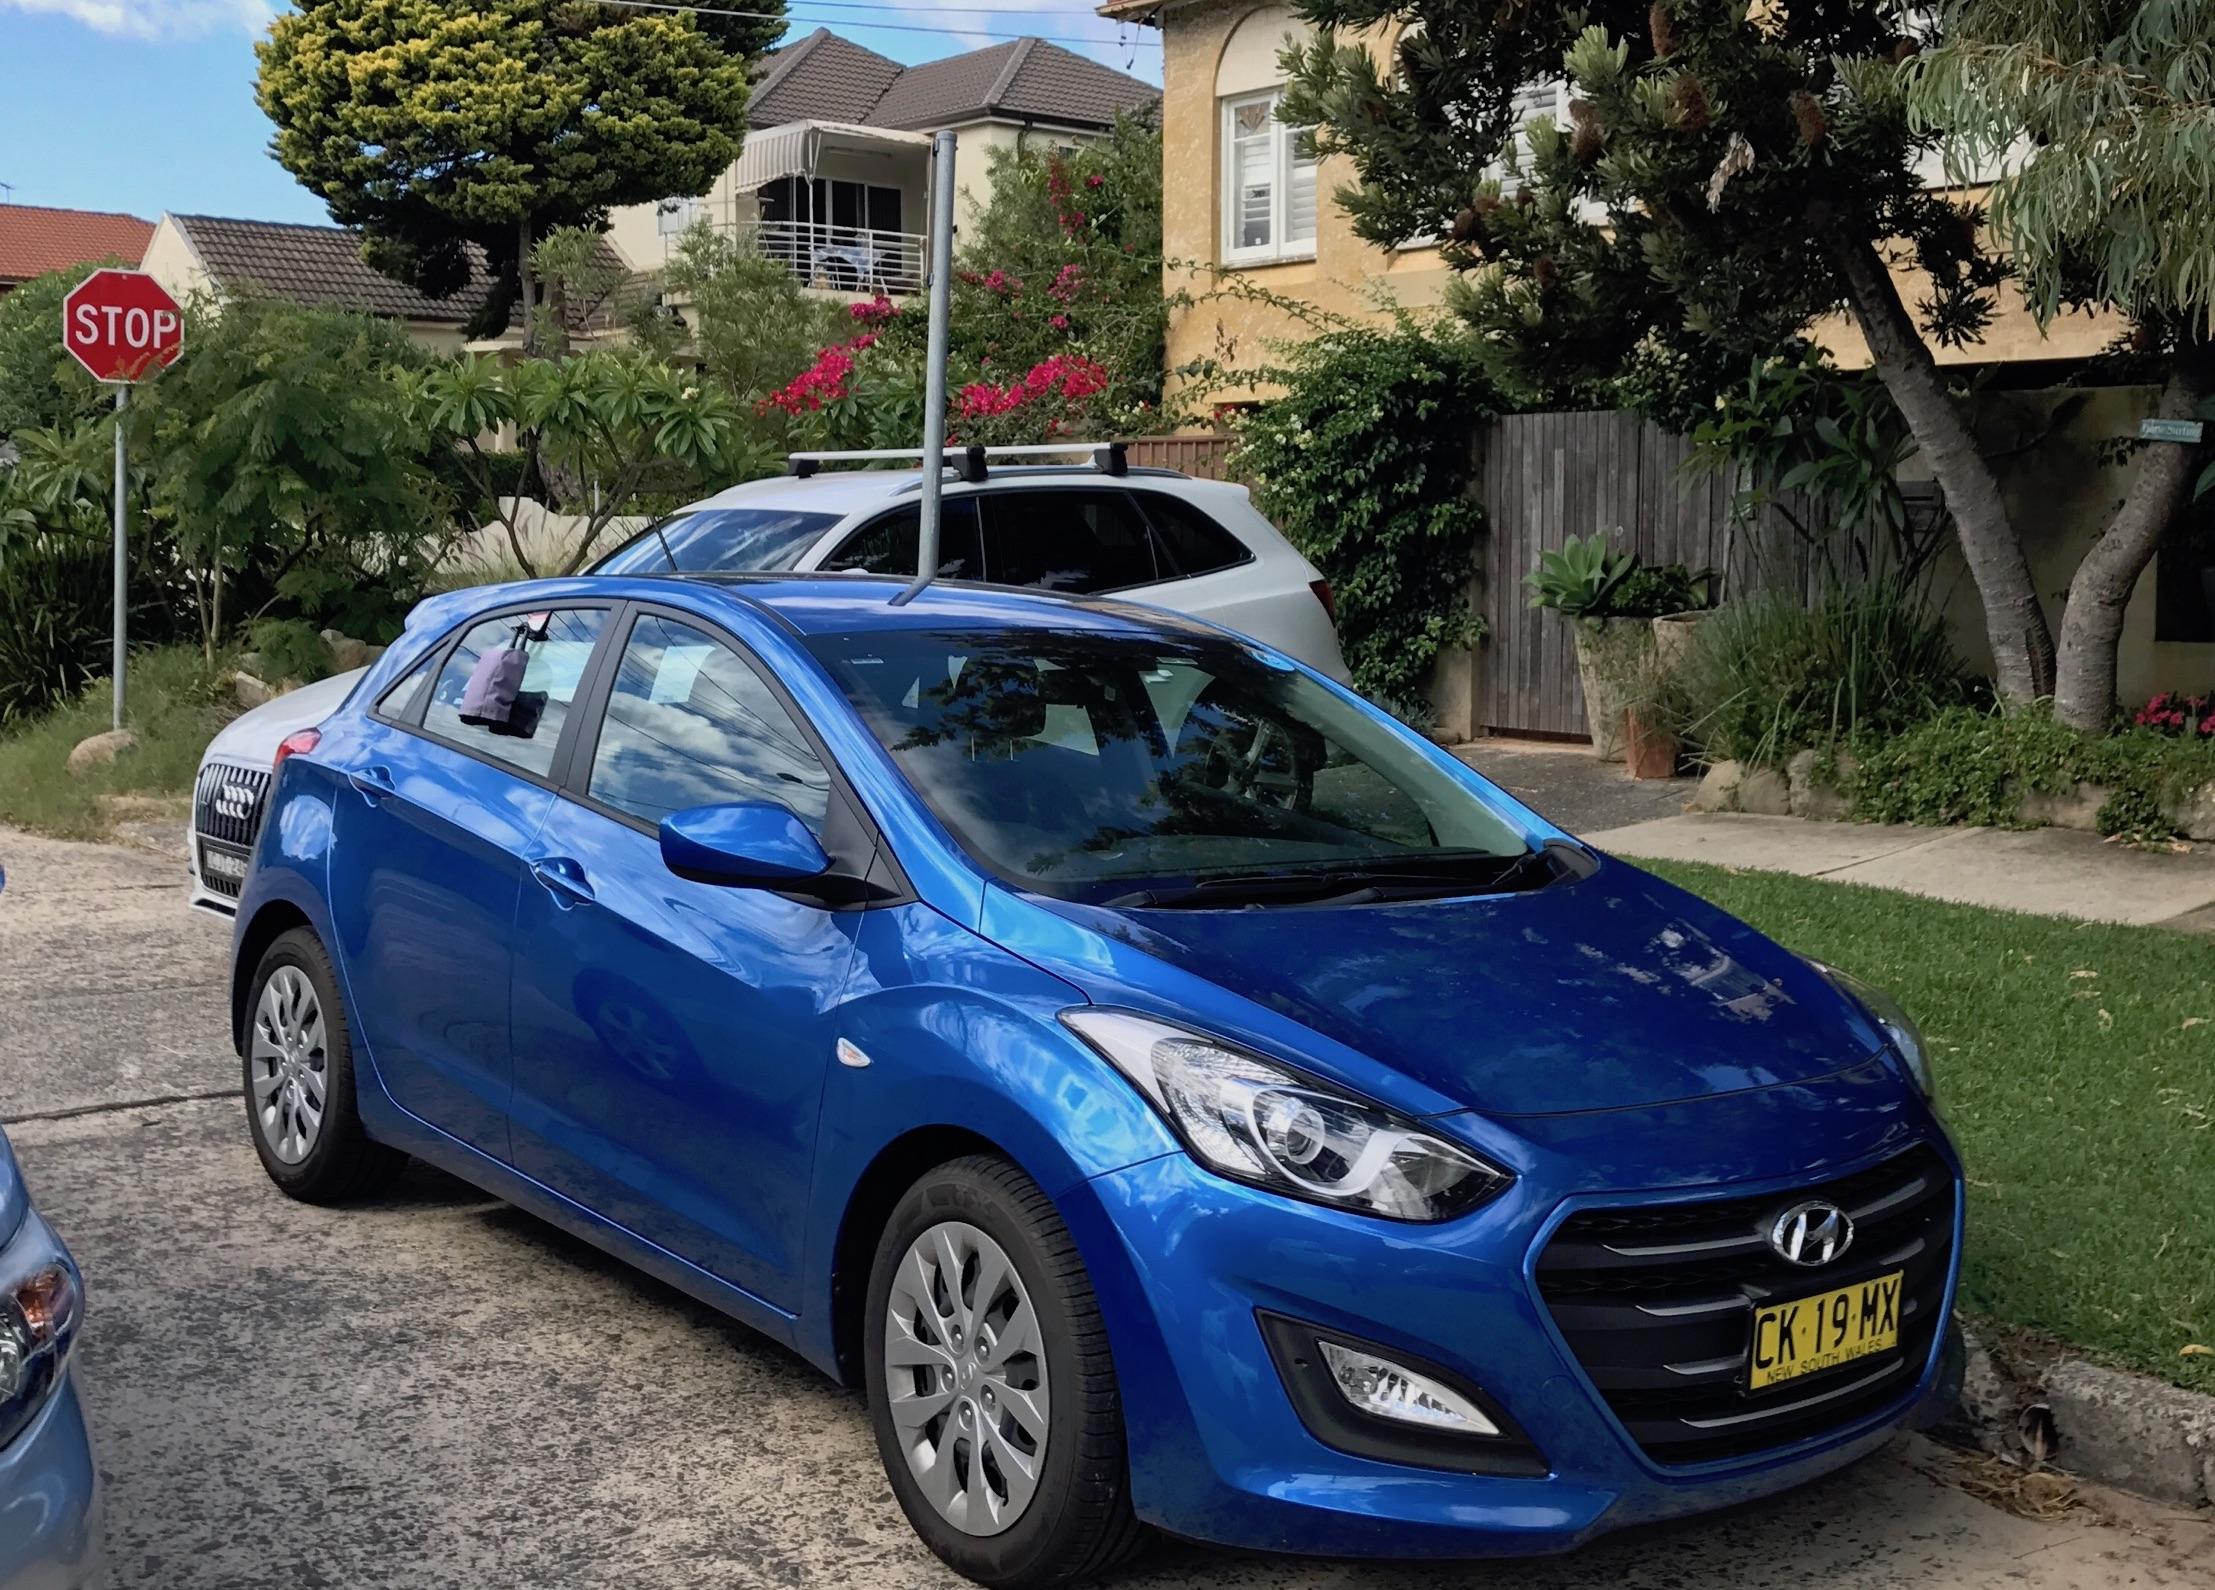 Picture of CarNextDoor's 2016 Hyundai i30